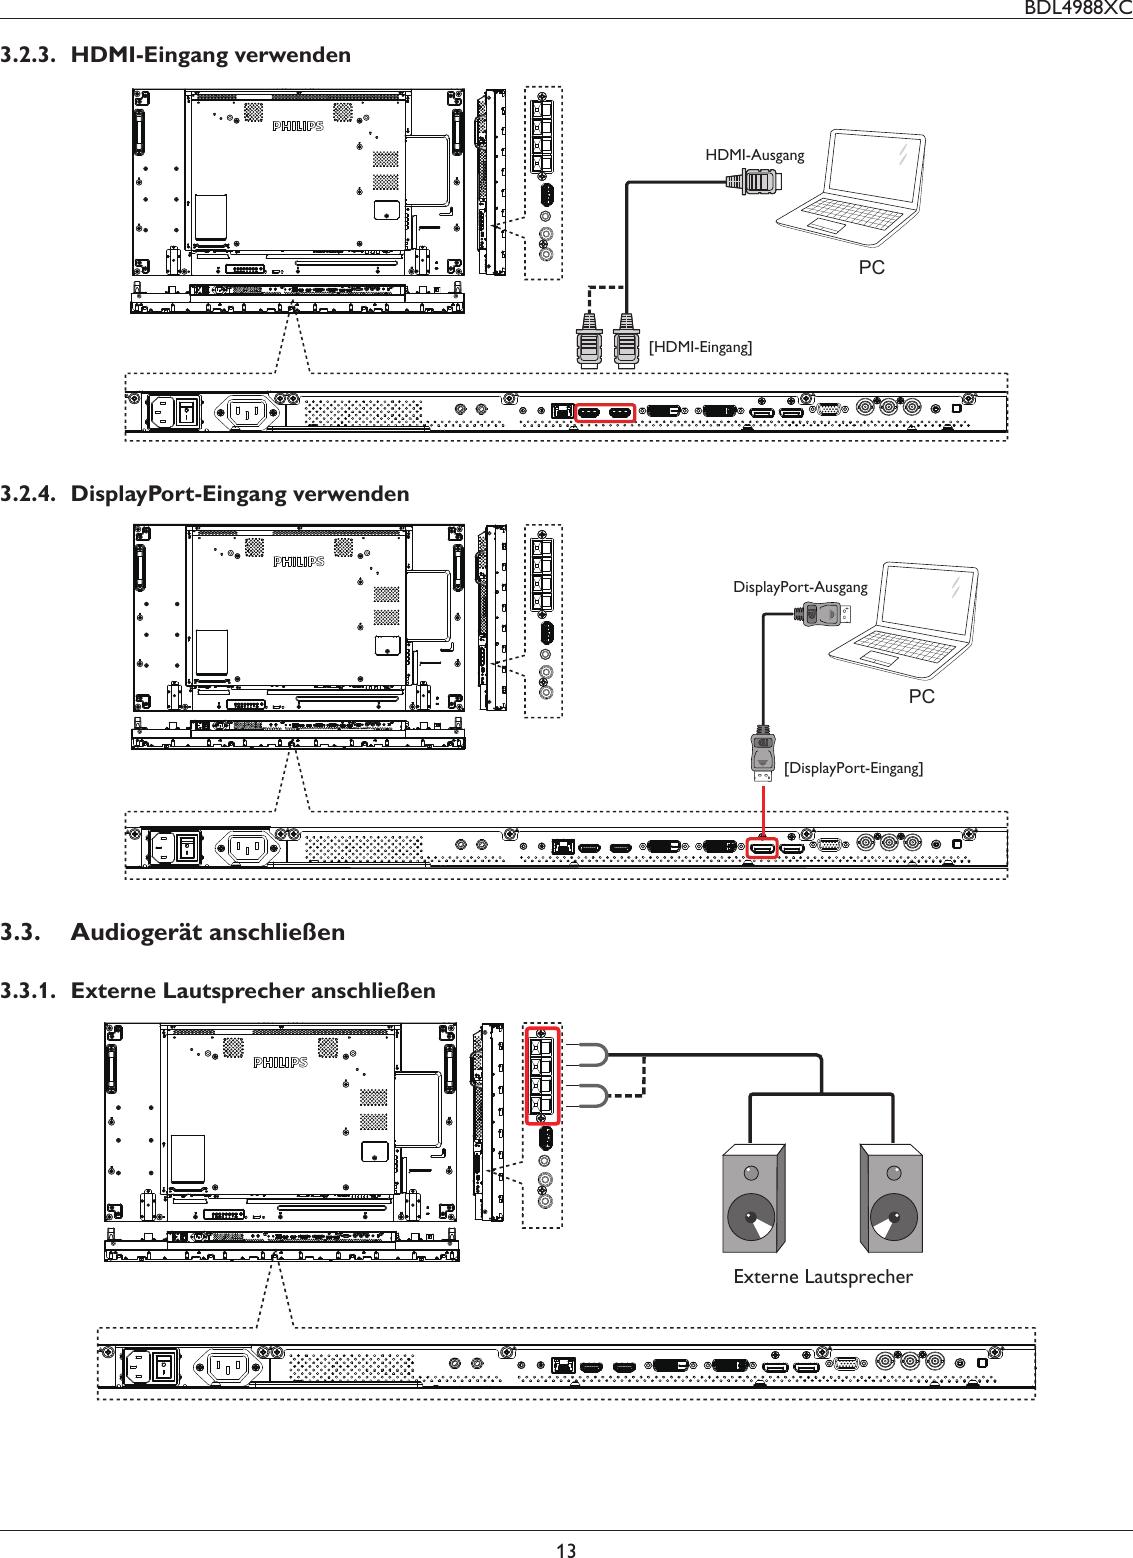 Philips Bdl4988xc 00 User Manual Dfu Deu Displayport Schematic Bdl4988xc13323 Hdmi Eingang Verwendenpchdmi Ausganghdmi Eingang32